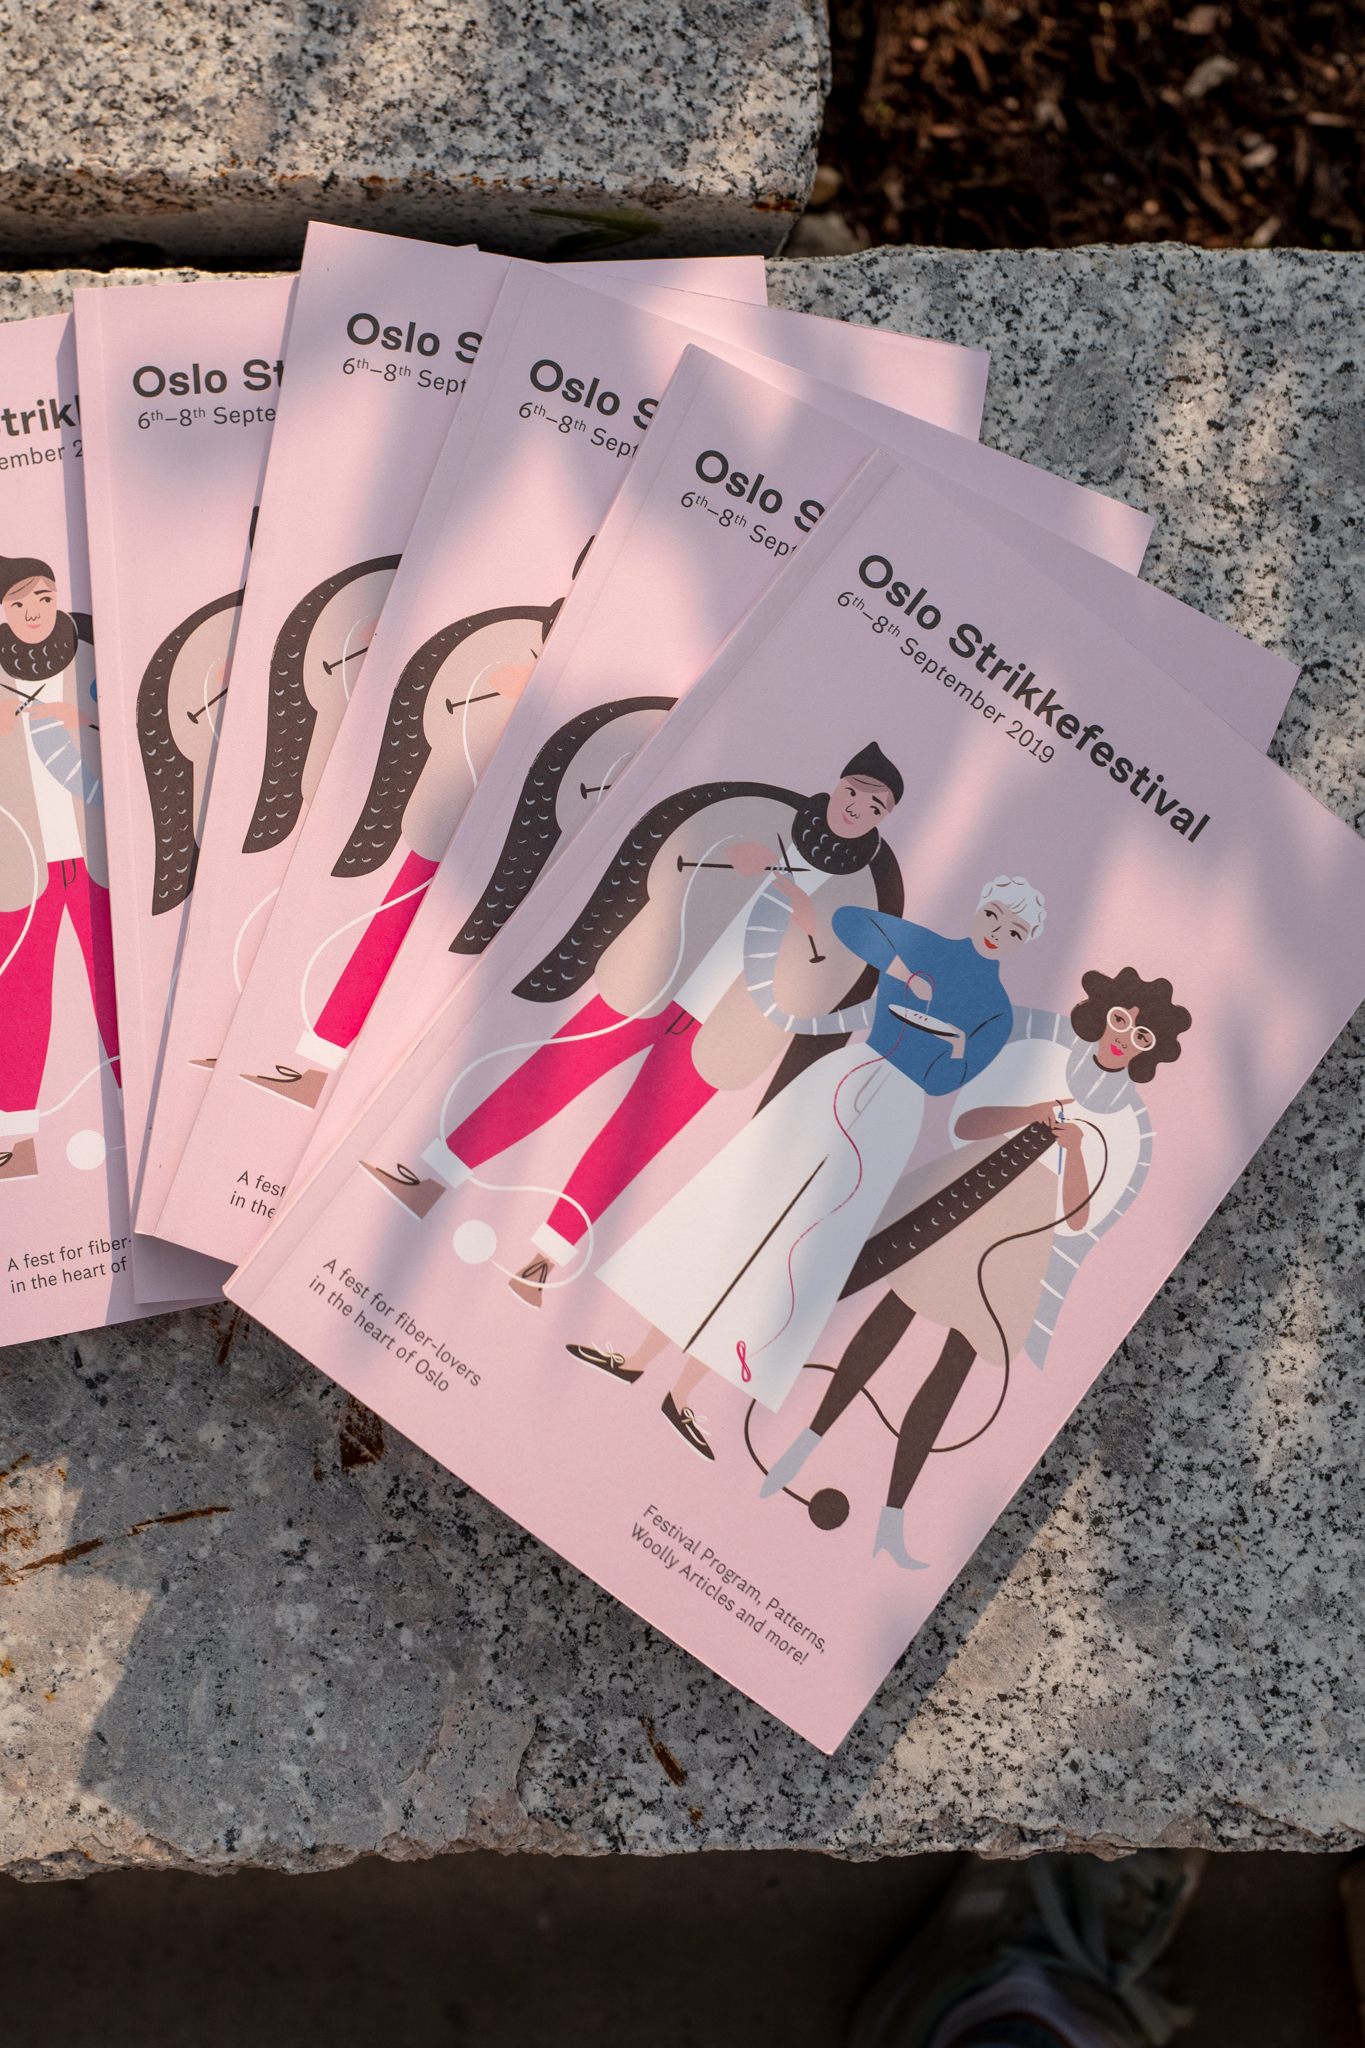 Festival Magazine 2019 — Oslo Strikkefestival